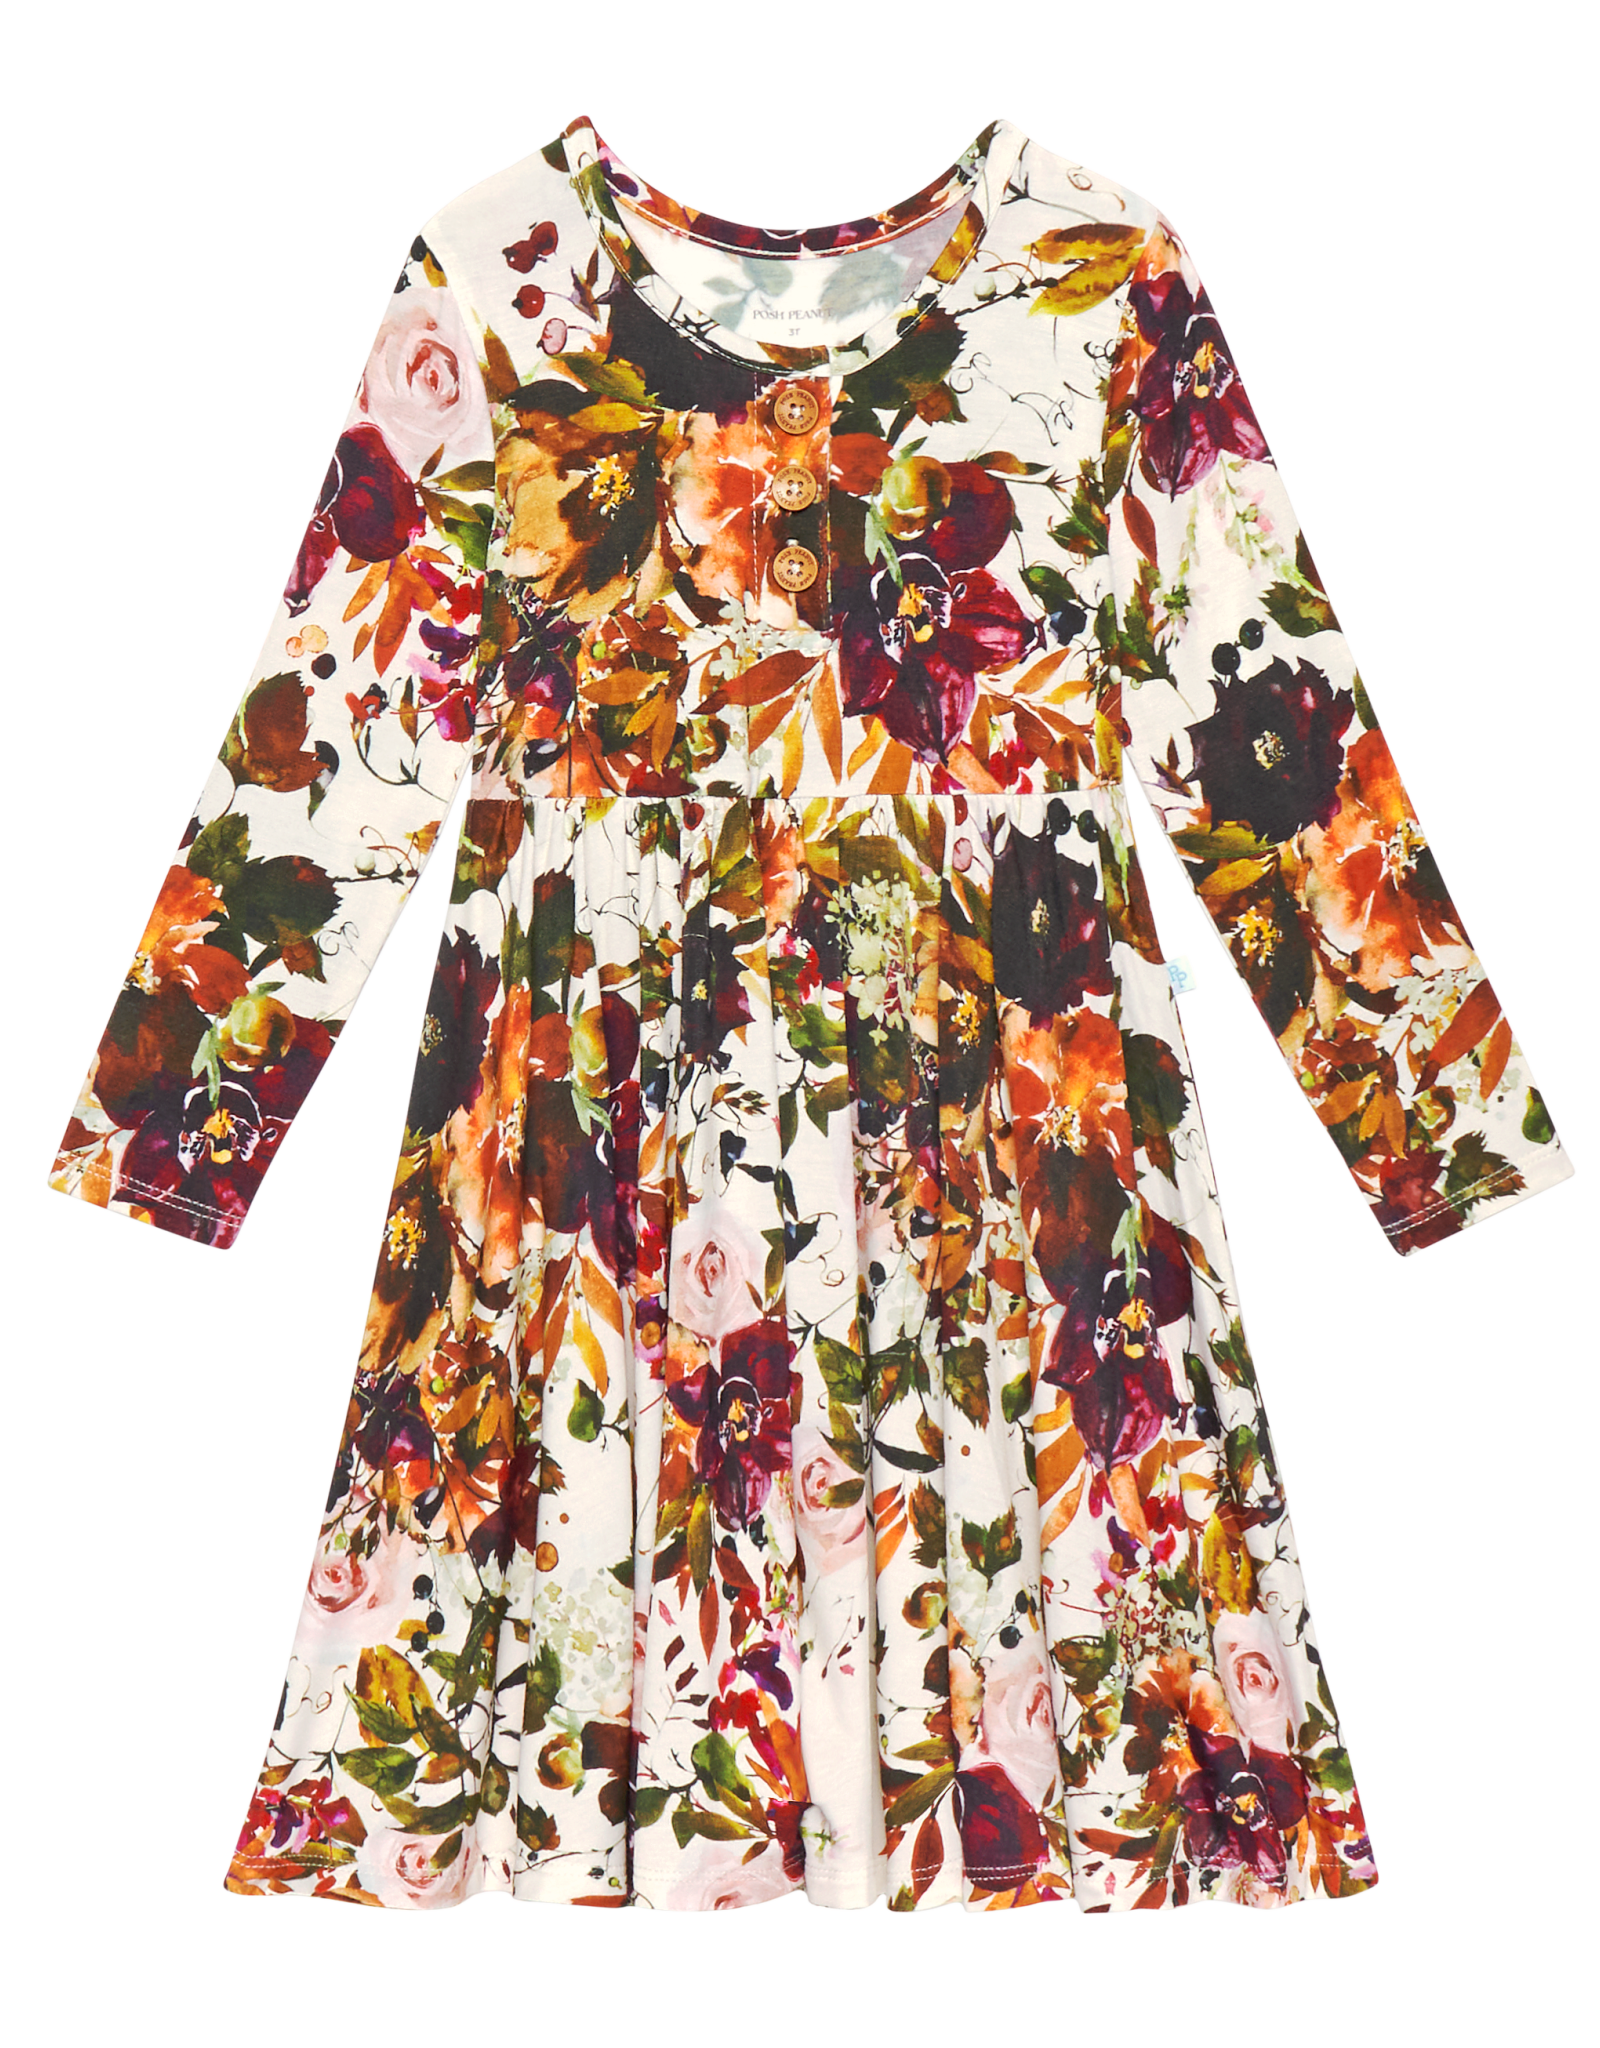 POSH PEANUT CORINNE LONG SLEEVE HENLEY TWIRL DRESS